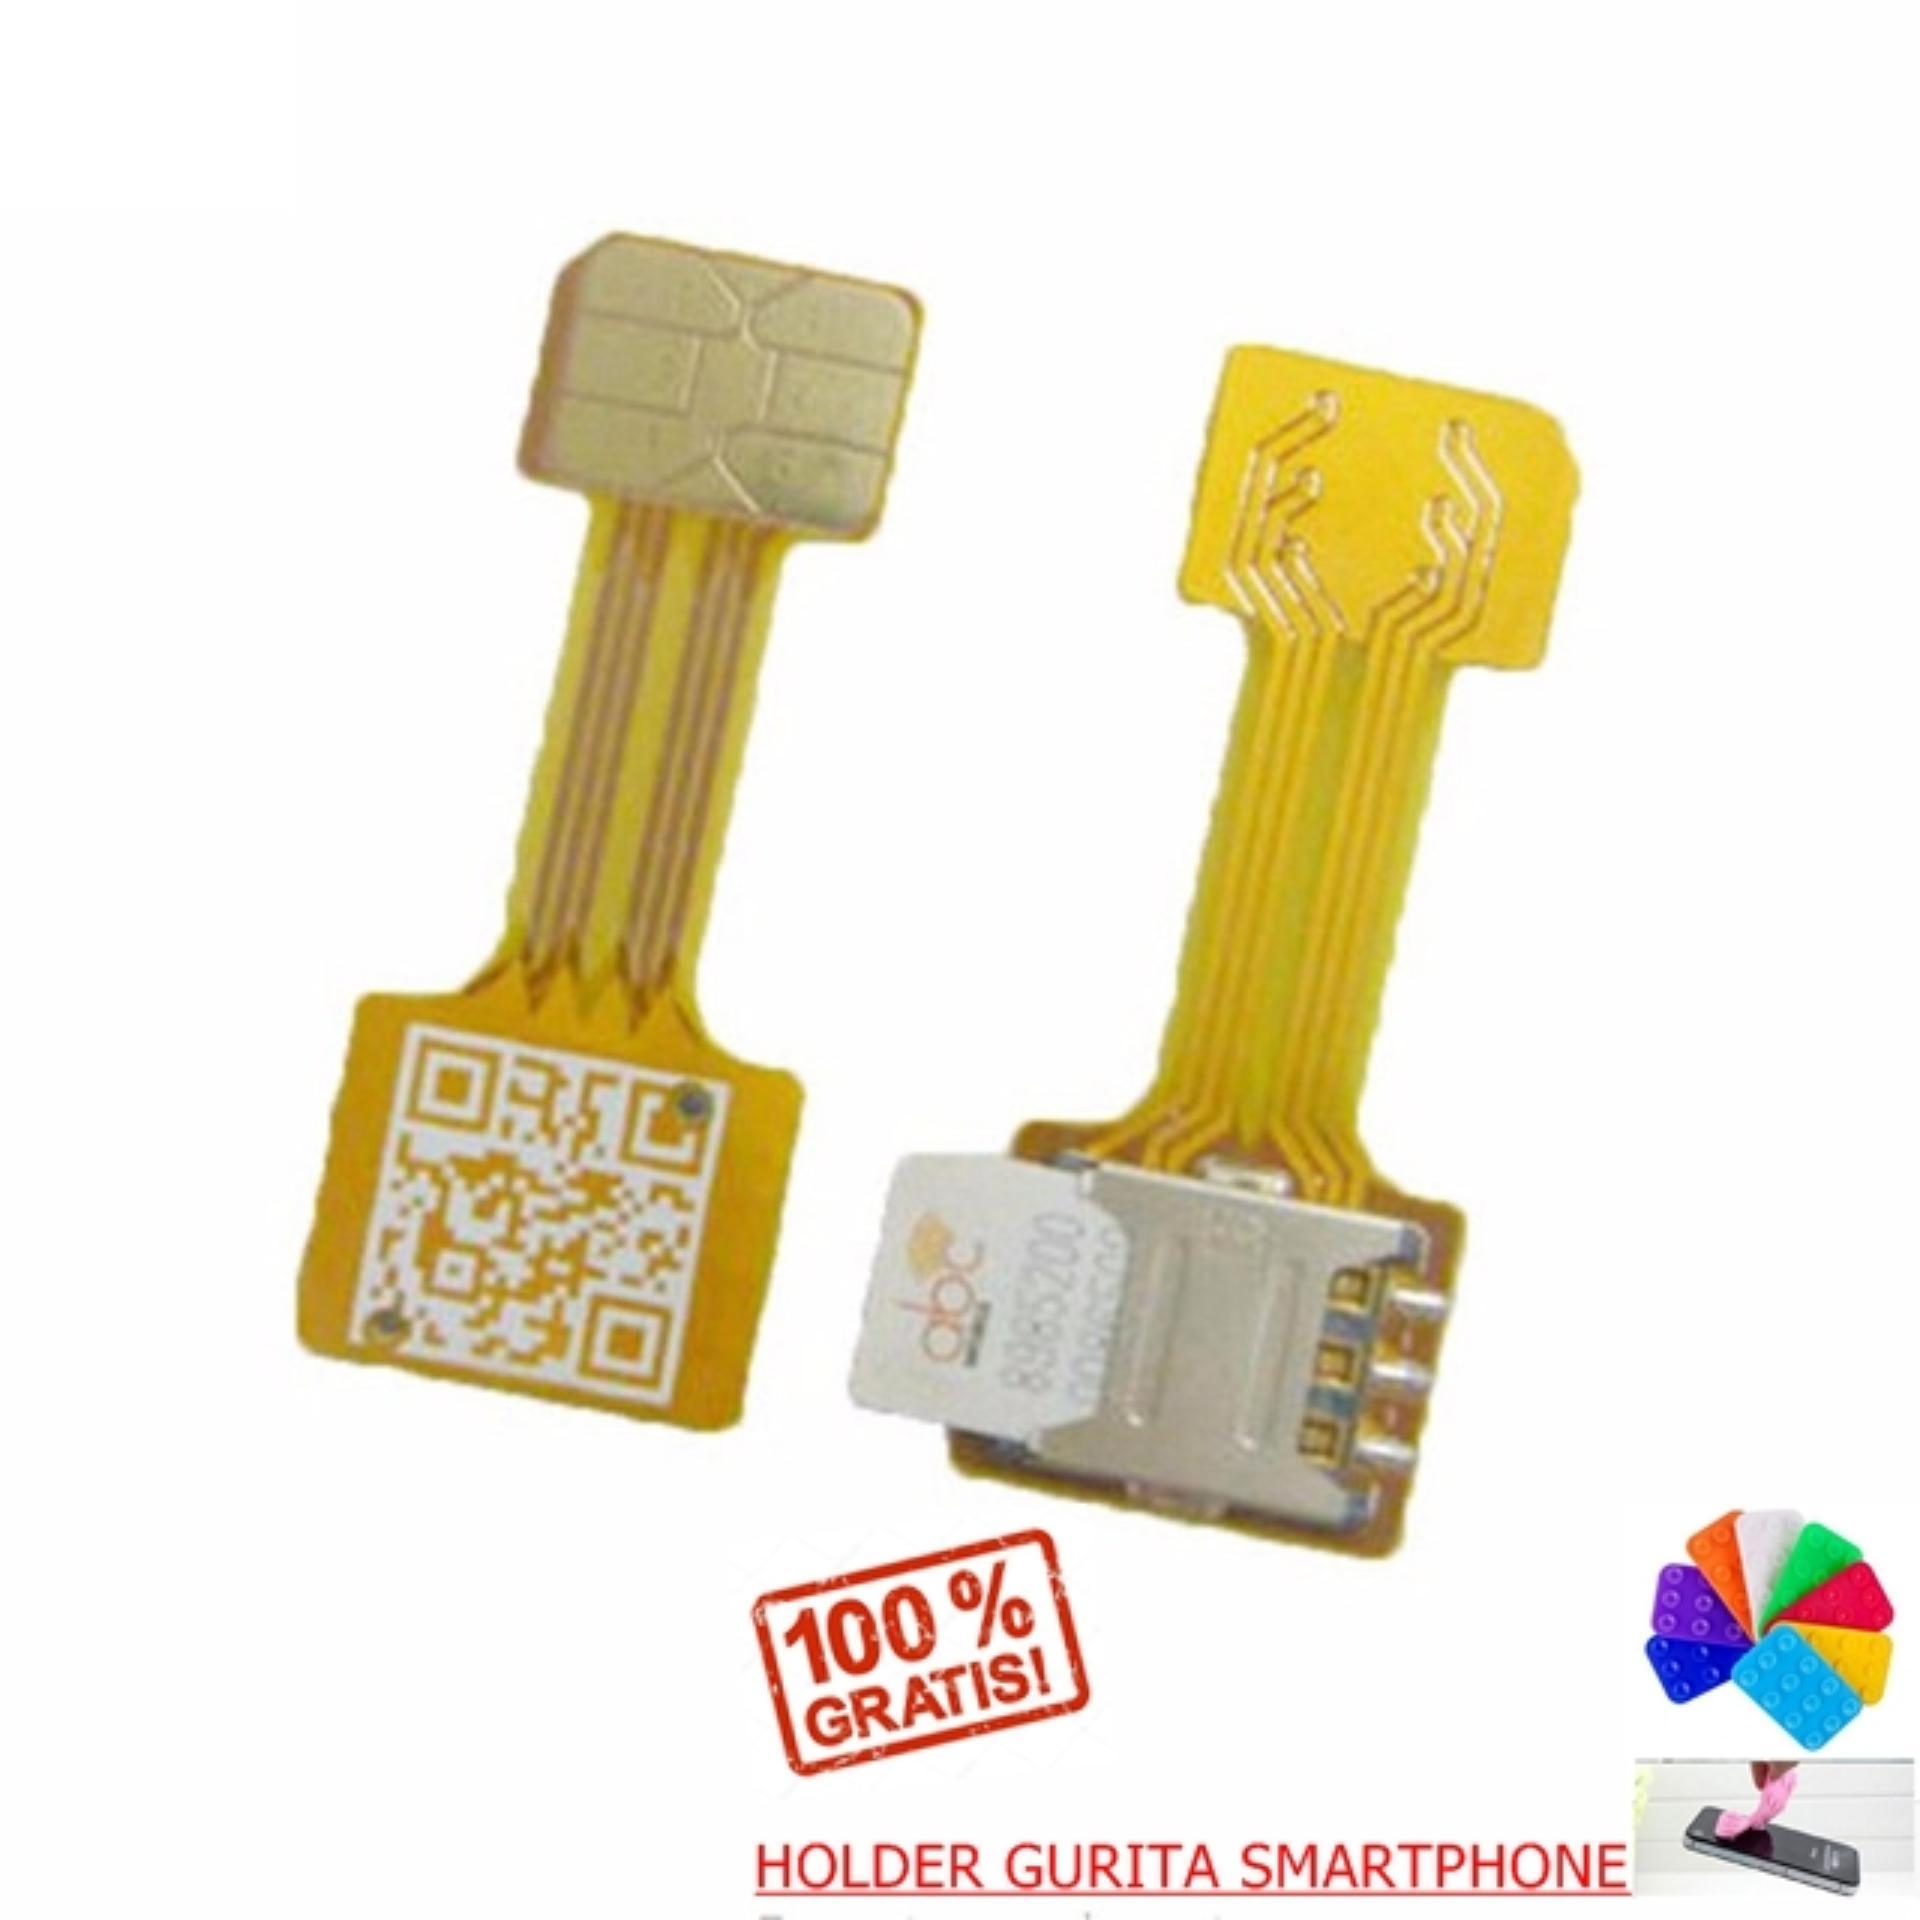 Xiaomi Micro Extender Hybrid Slot SIM Dual SIM Converter Adapter + Free Holder Gurita